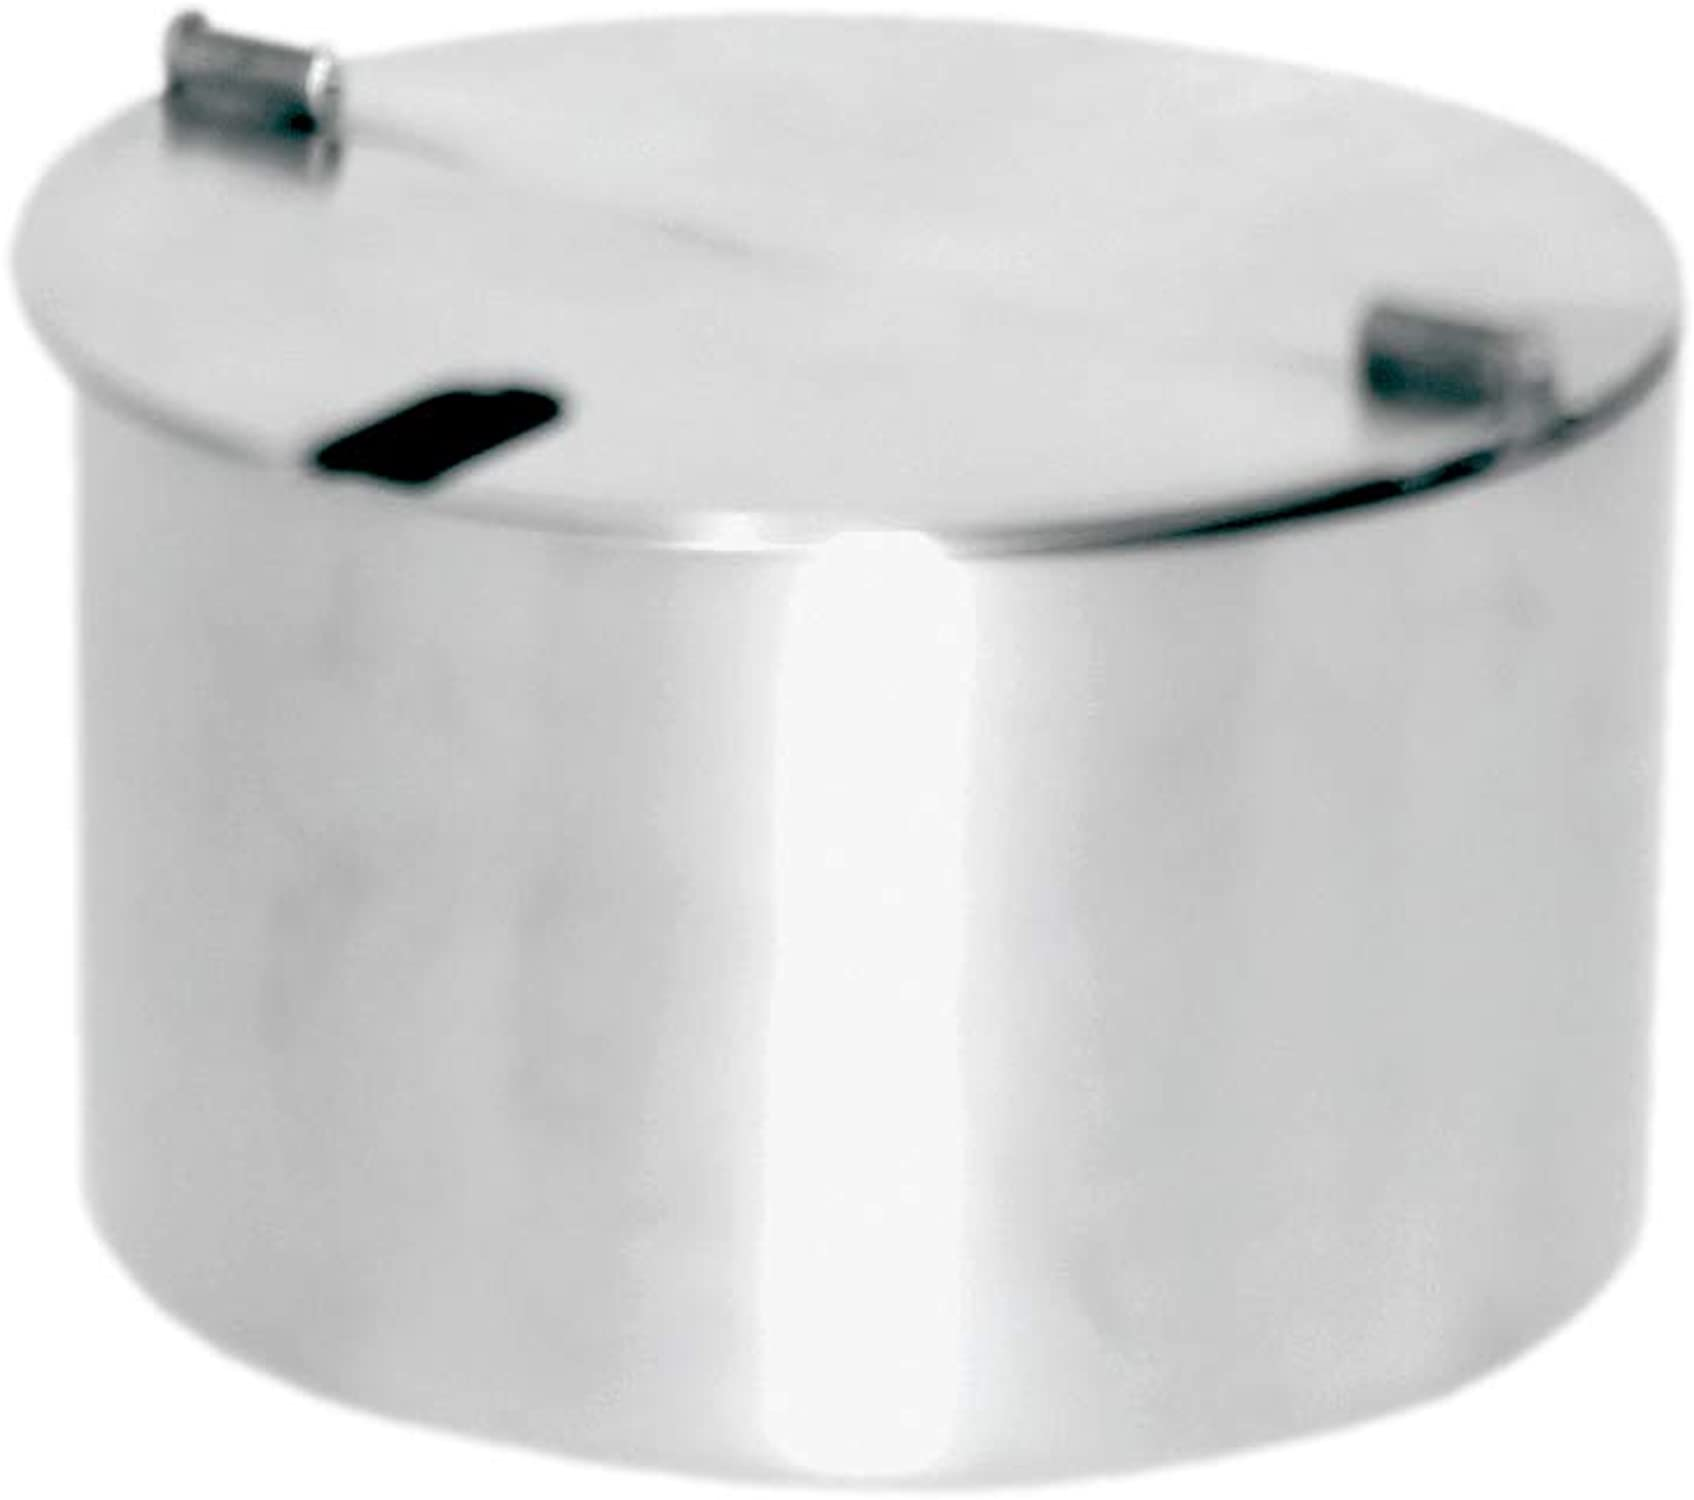 Steelforme Miroir en acier inoxydable Bol à sucre